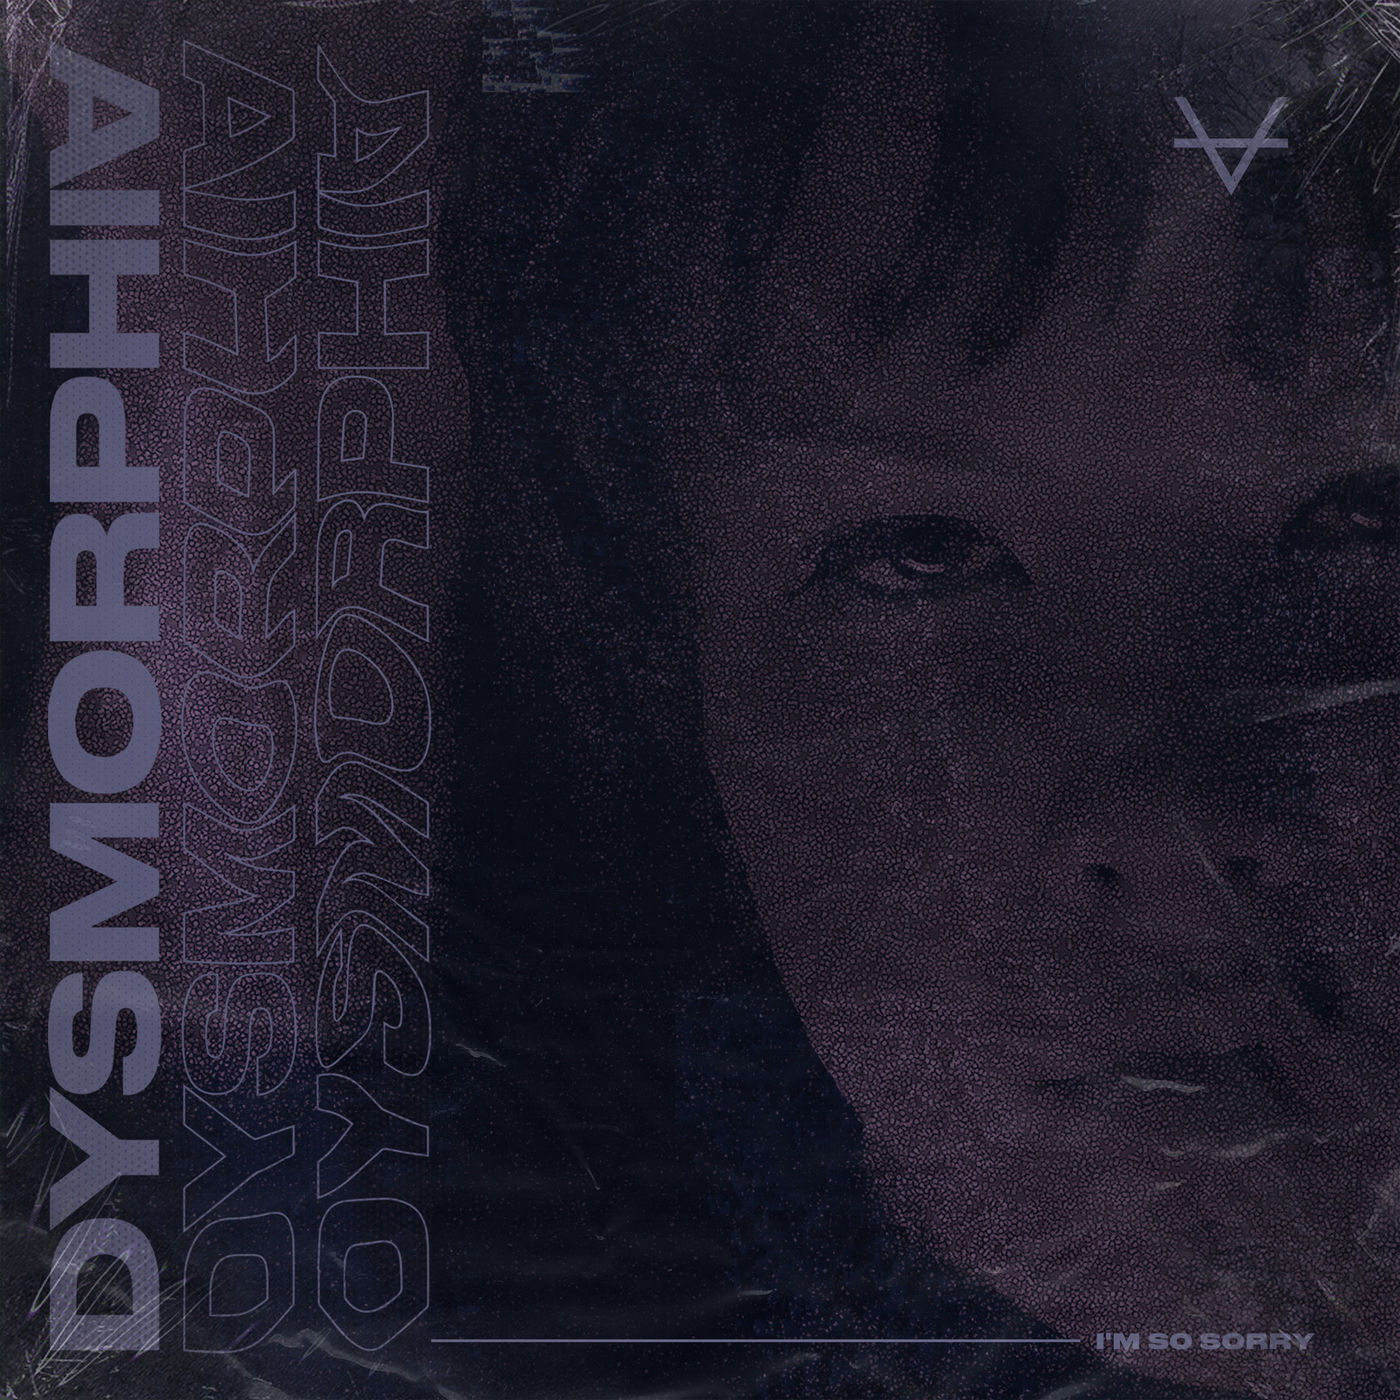 Nomvdic - Dysmorphia (I'm so Sorry) [single] (2019)